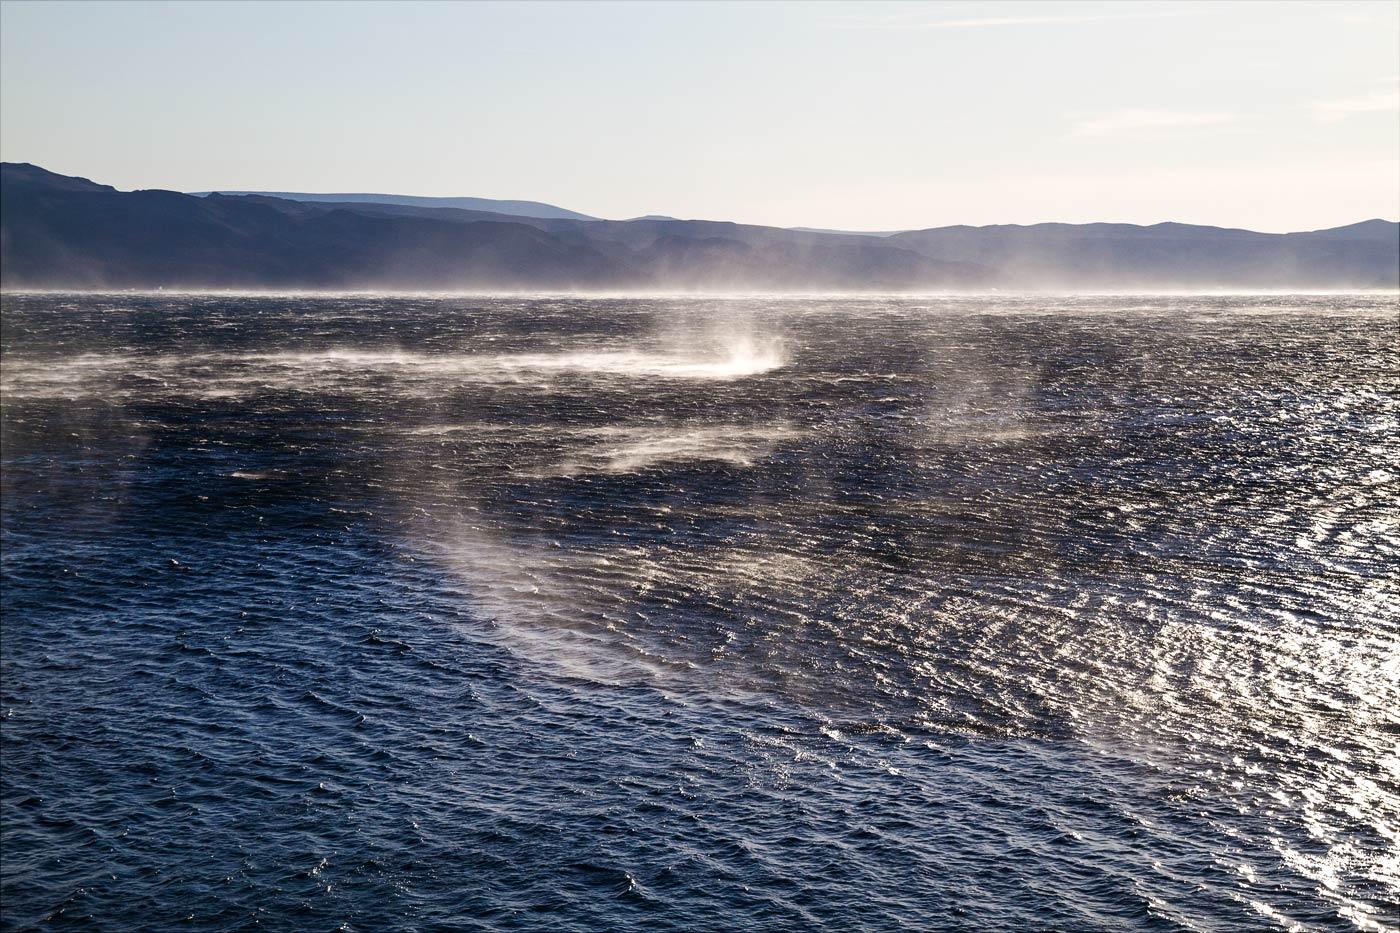 Водяные вихри на заливе, Хорватия